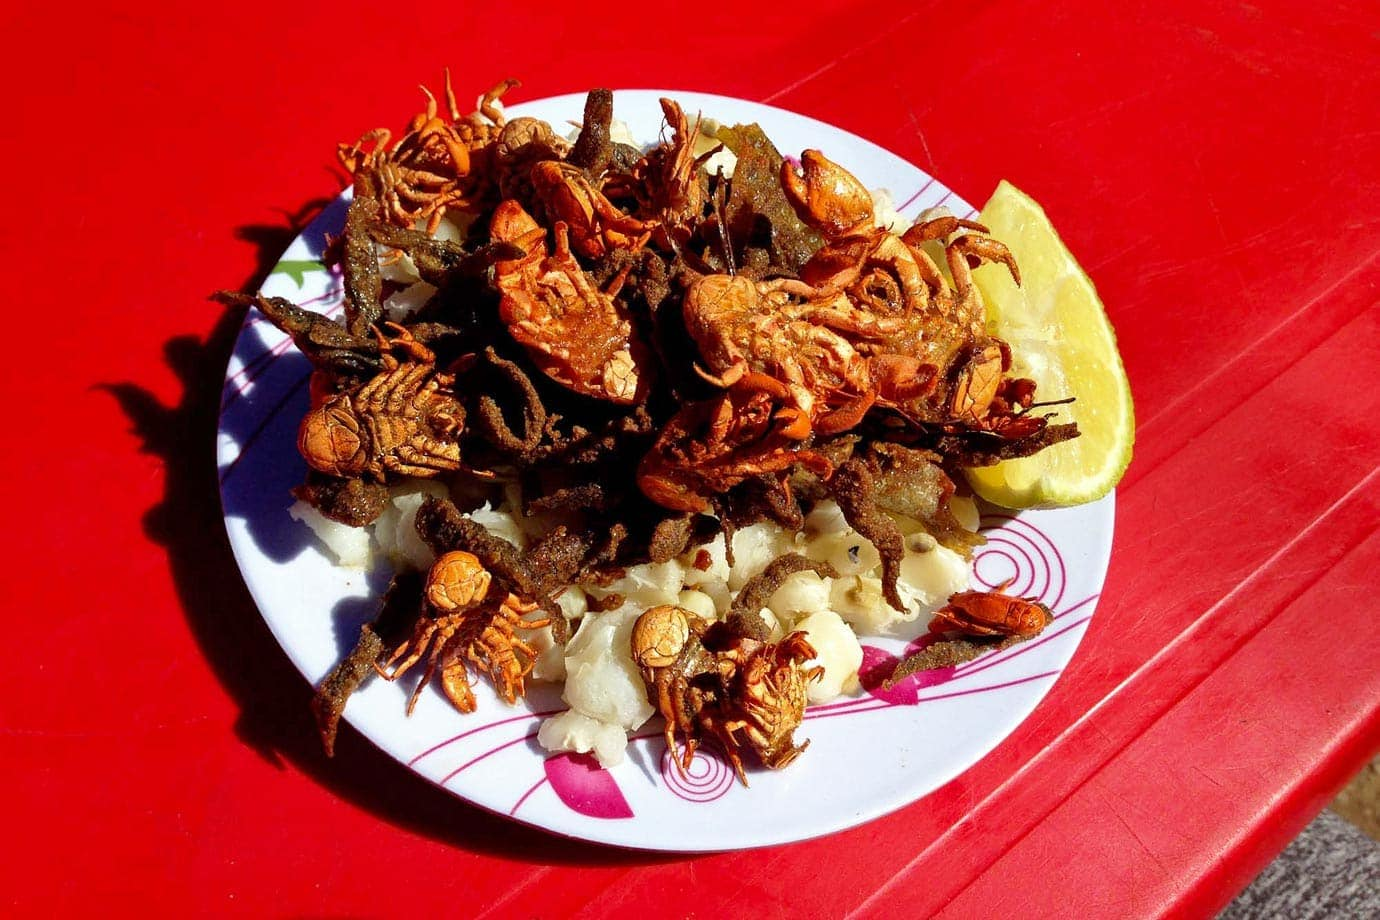 How Does Bolivia Taste?